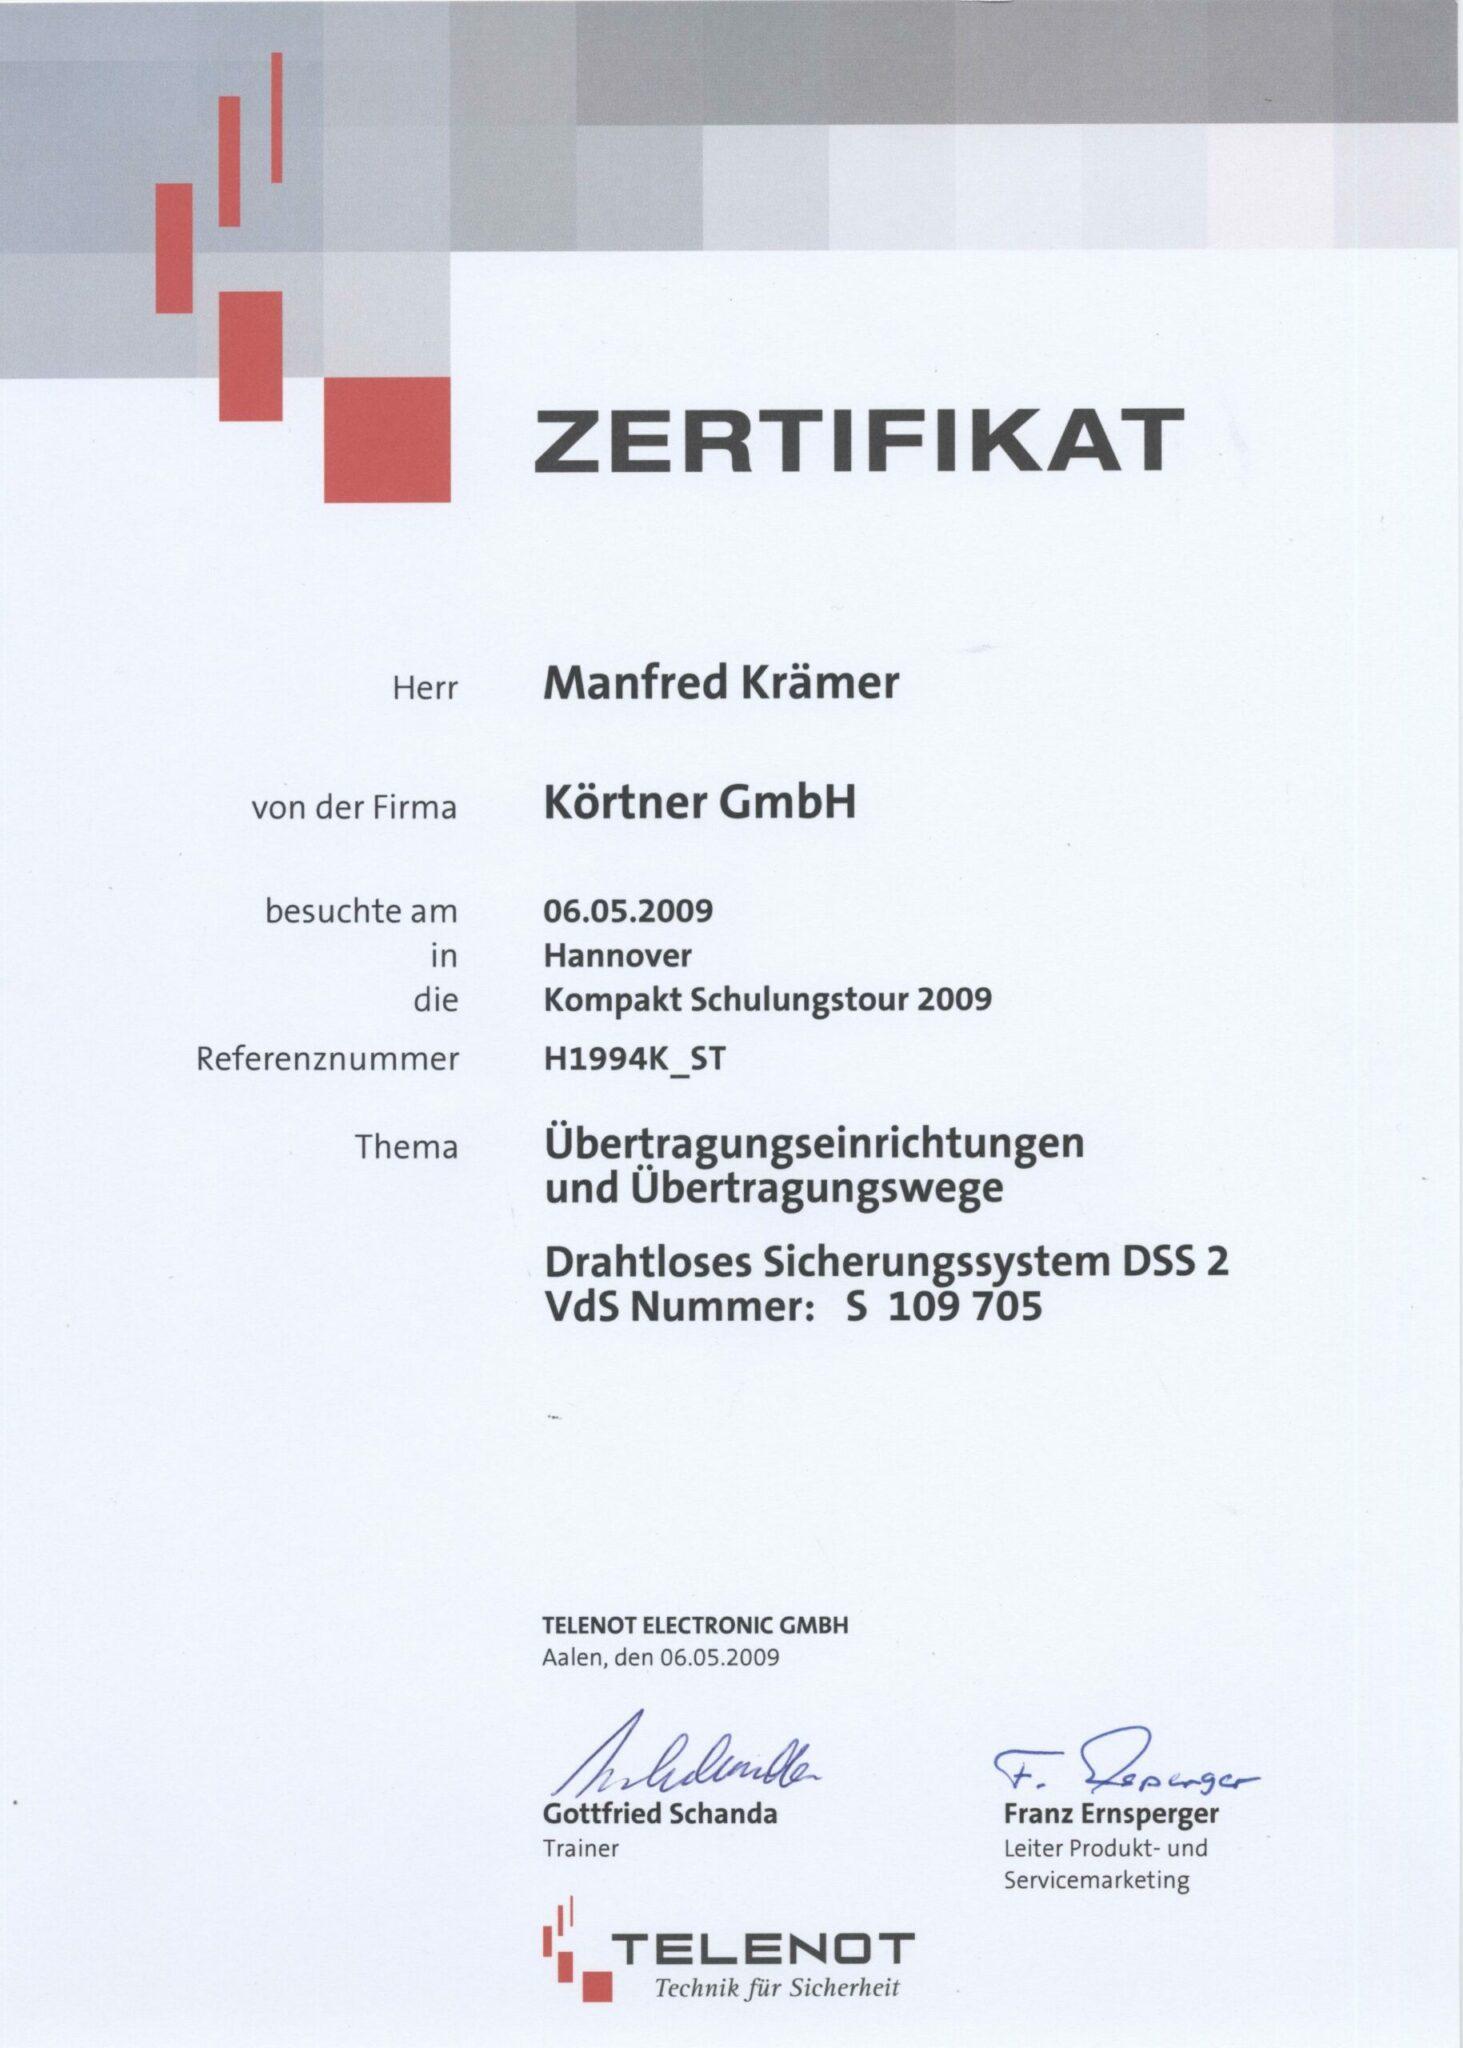 Telenot-2009